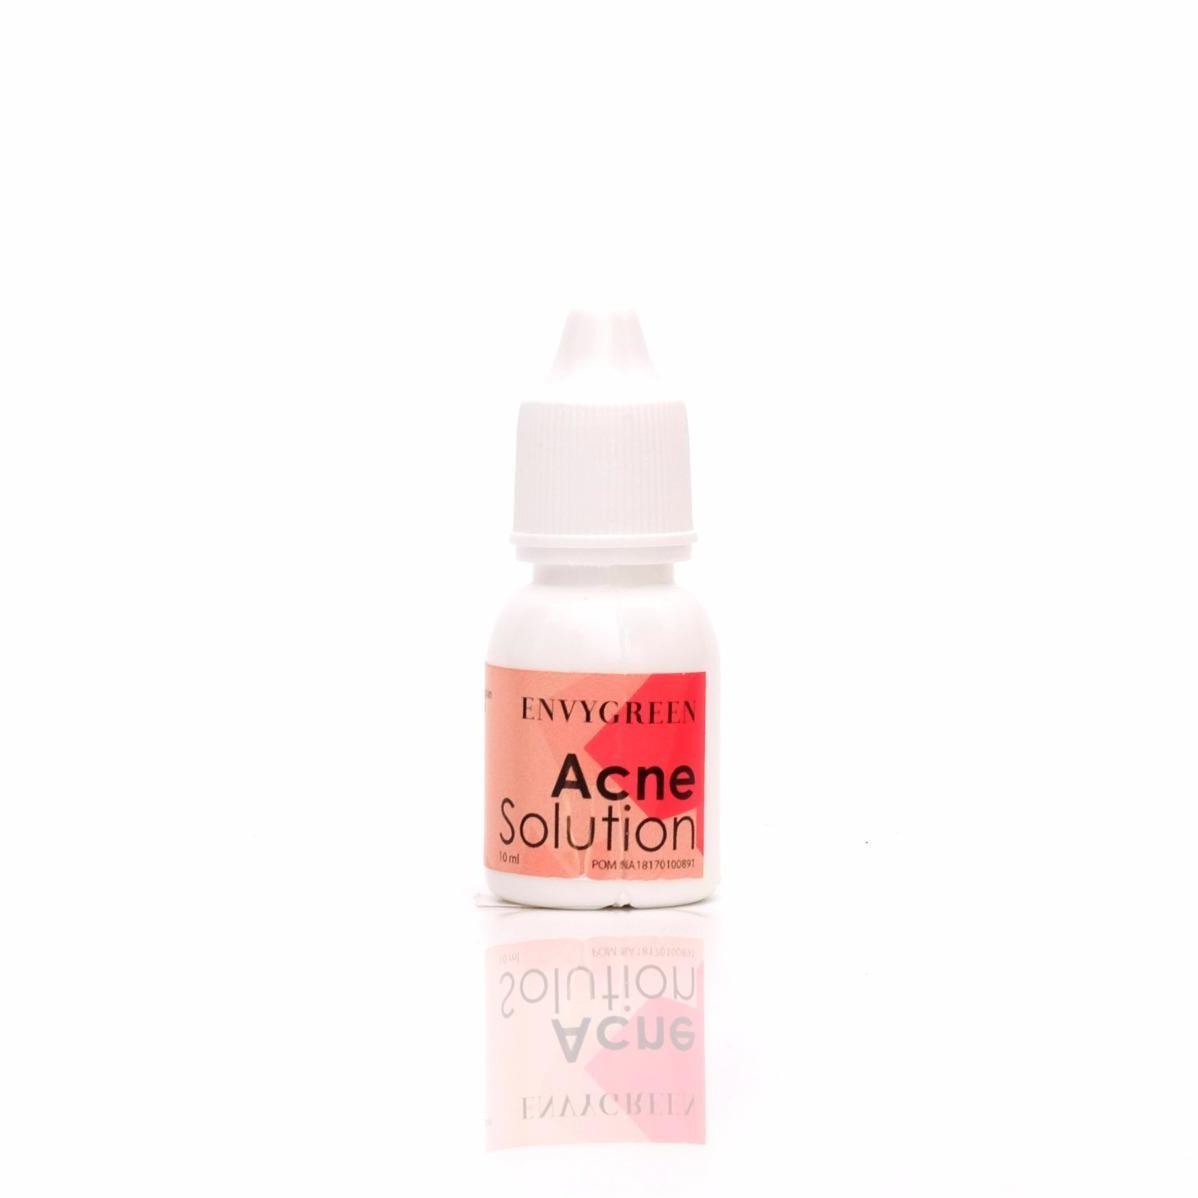 ENVYGREEN Acne Solution